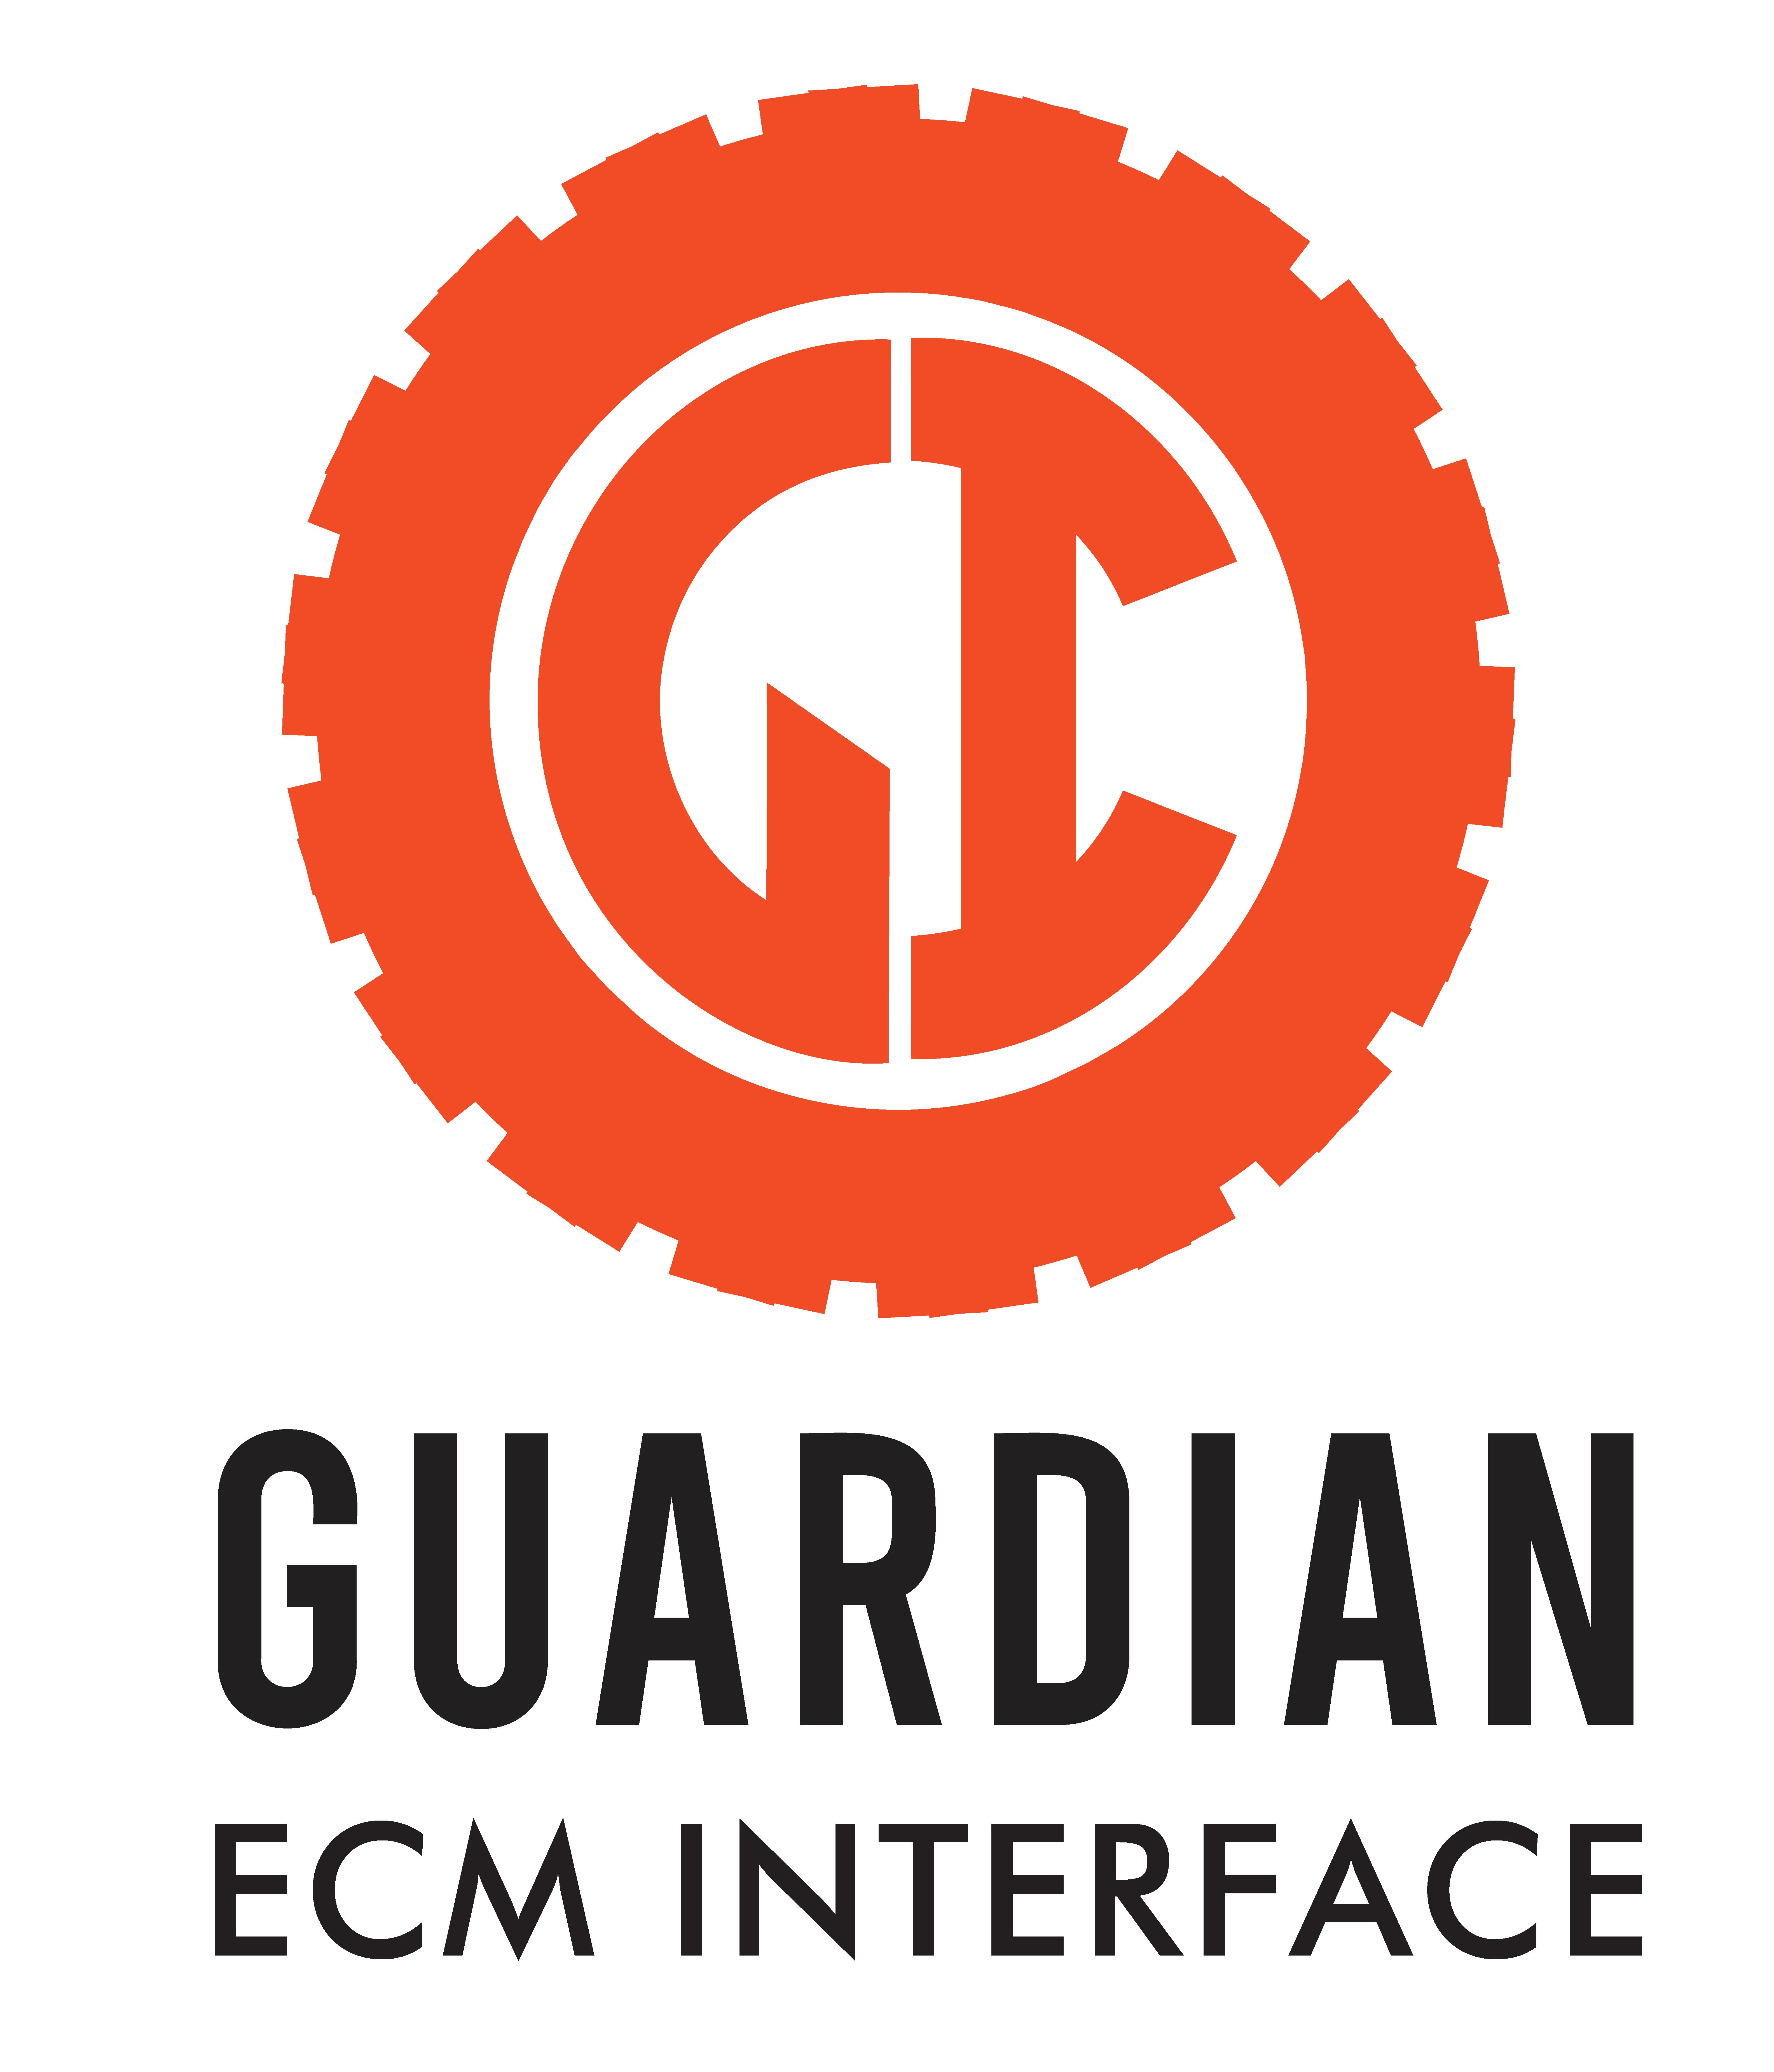 Guardian ECM Interface Logo 0.03-01